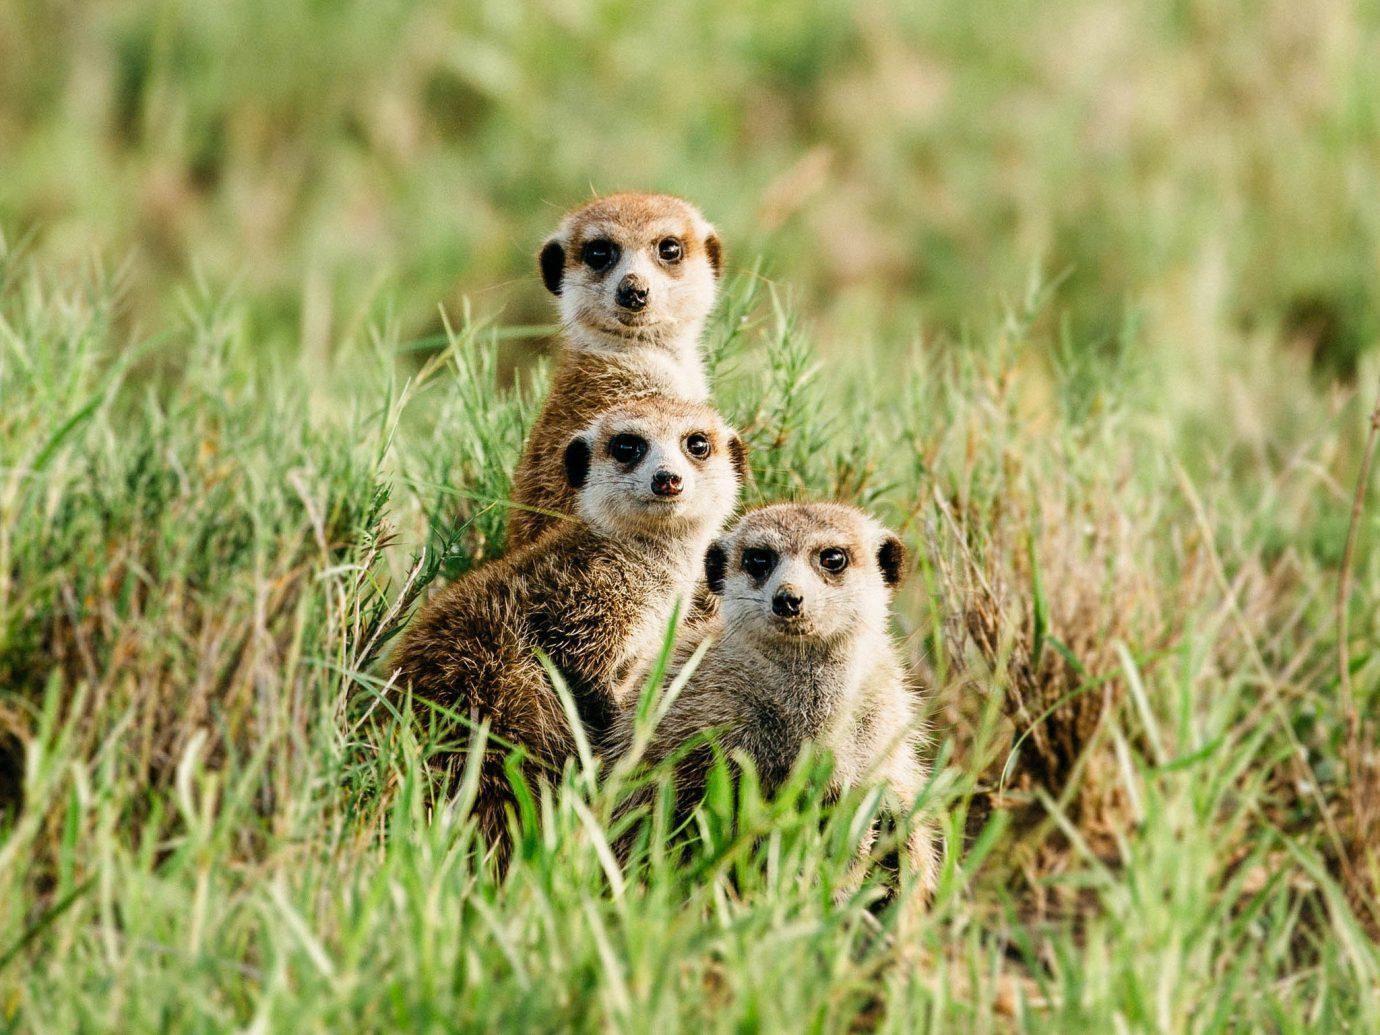 Outdoor Activities Safari Trip Ideas Wildlife mammal ecosystem fauna grassland grass terrestrial animal cheetah prairie meerkat ecoregion prairie dog grass family whiskers snout